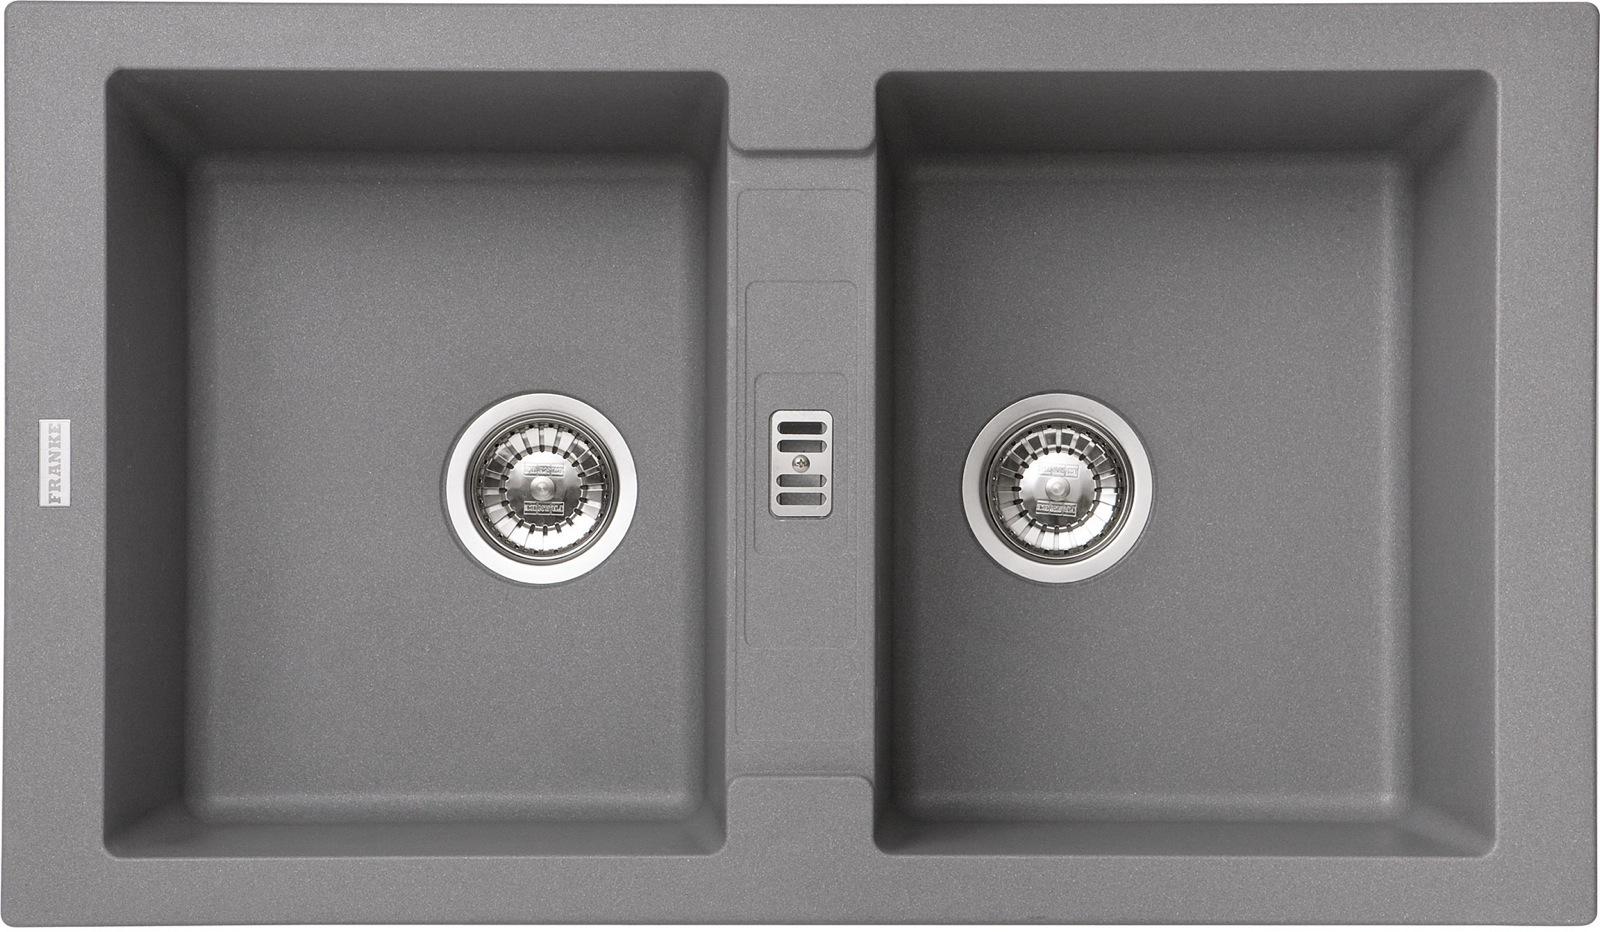 Chiuveta bucatarie fragranite Franke Maris MRG 620 reversibila 860x500mm tehnologie Sanitized Alluminio poza